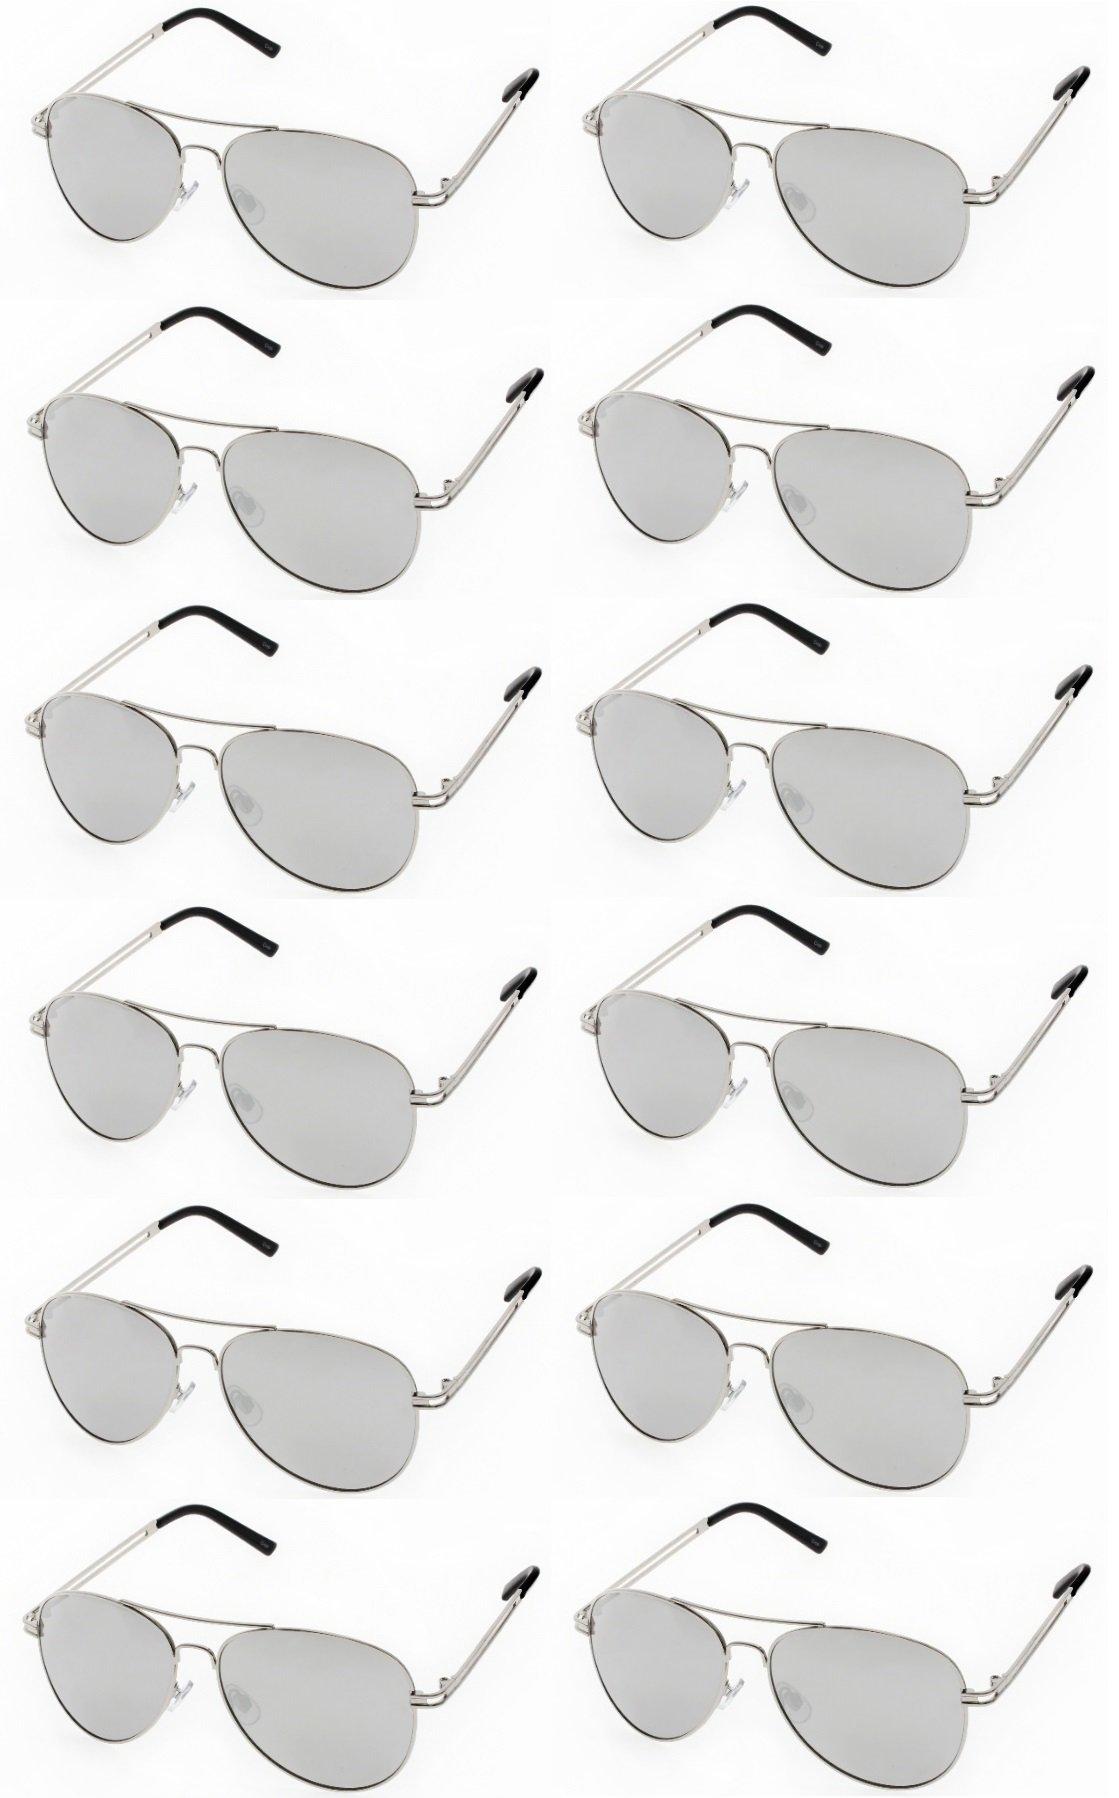 AVIATOR SUNGLASSES - Classic & Stylish Retro Sunglasses Bulk Wholesale (12 Pack)